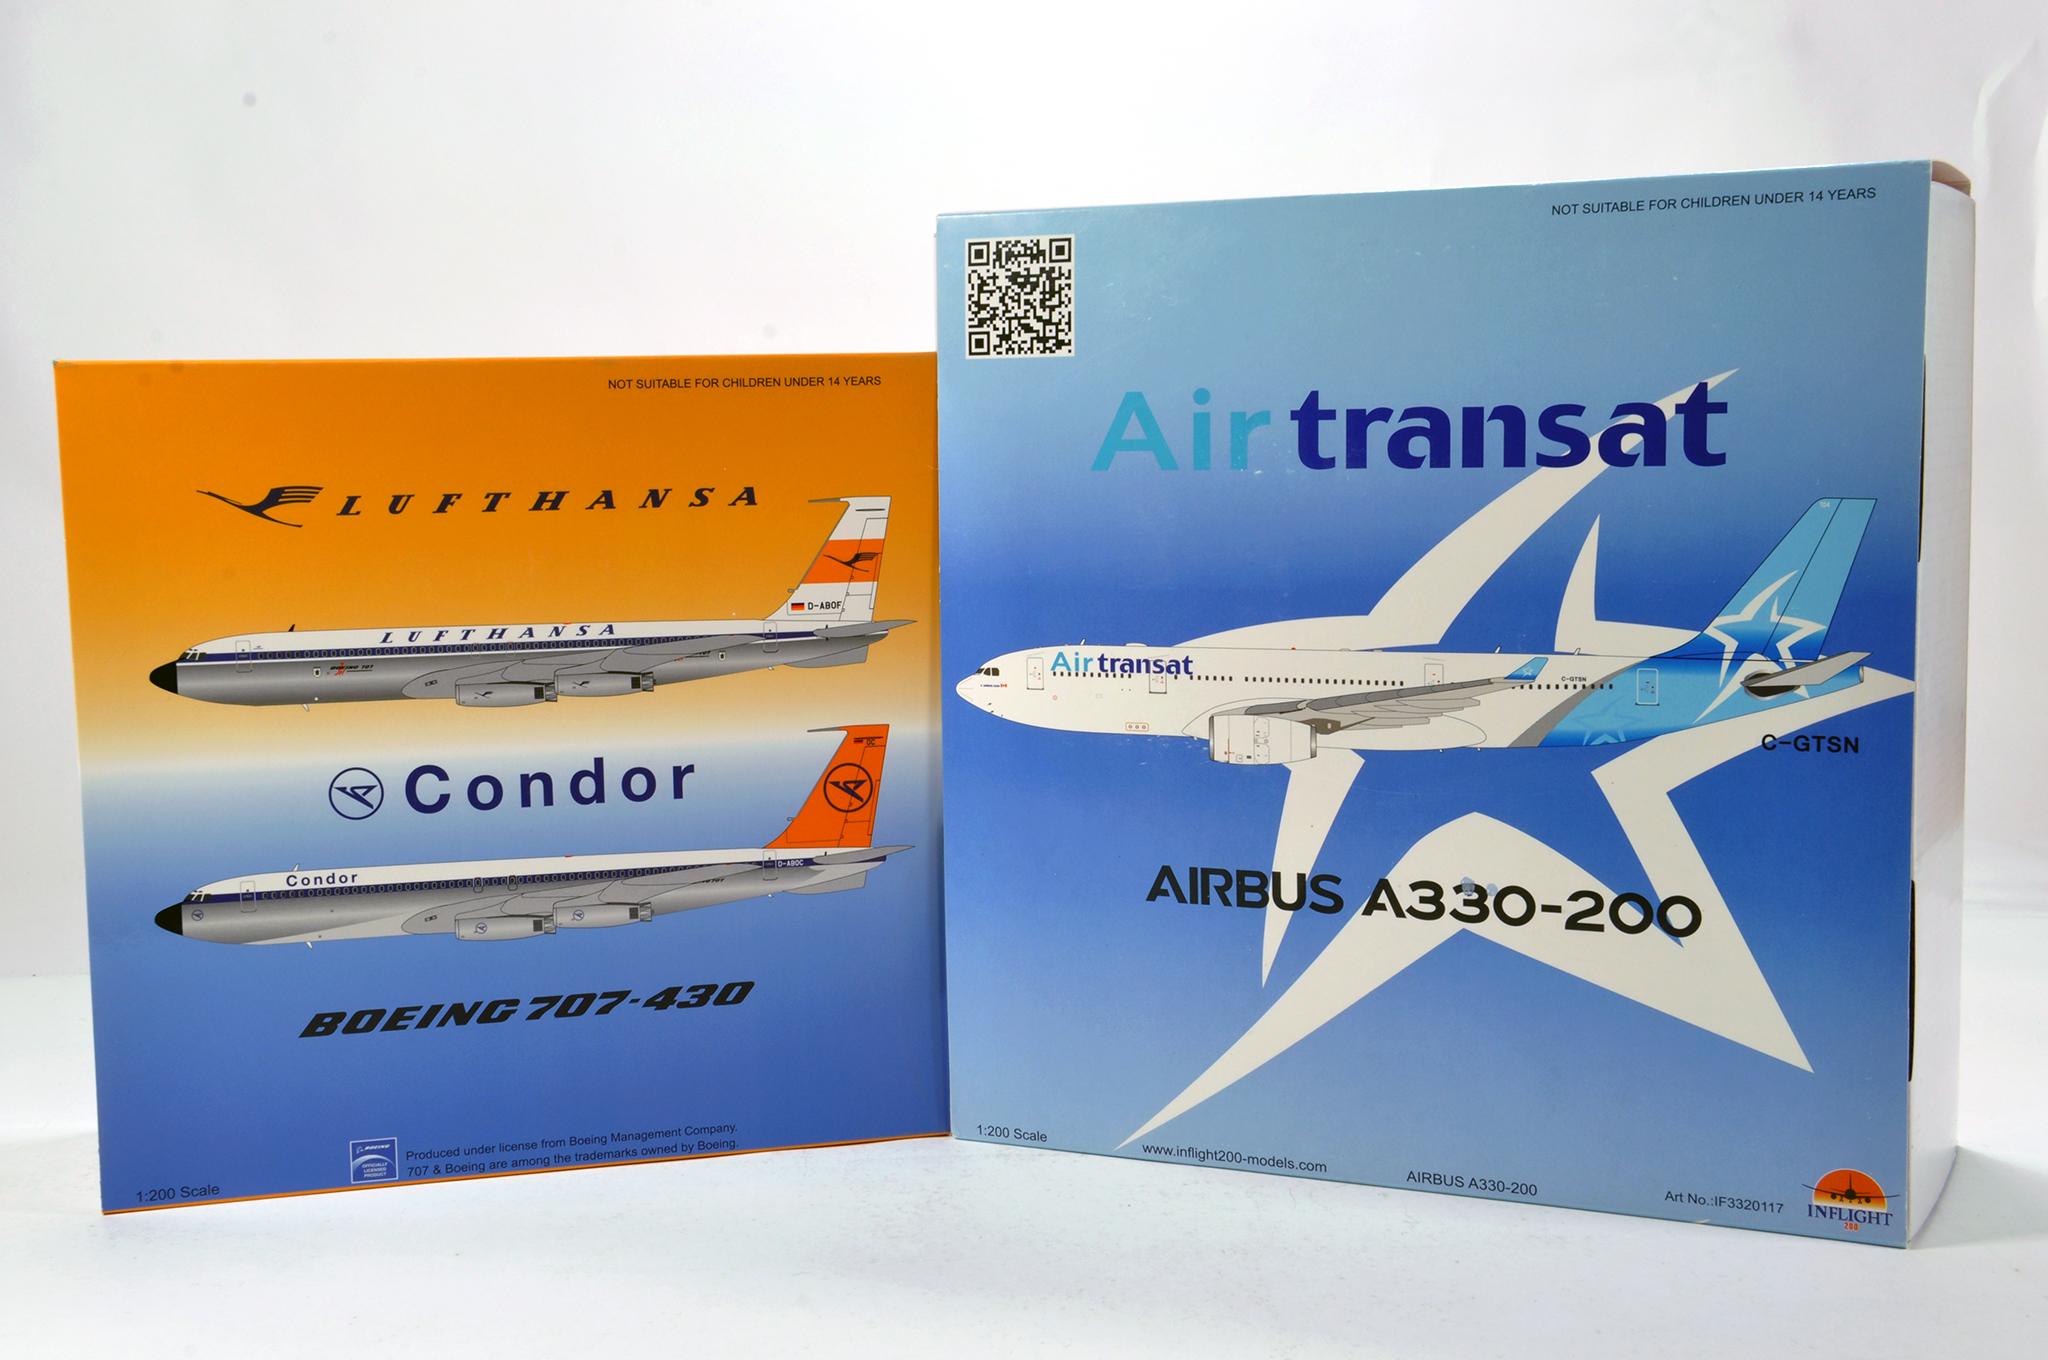 Lot 48 - Inflight Models 1/200 Diecast Aircraft Models comprising Boeing 707 plus Airbus A330 Air Transat.